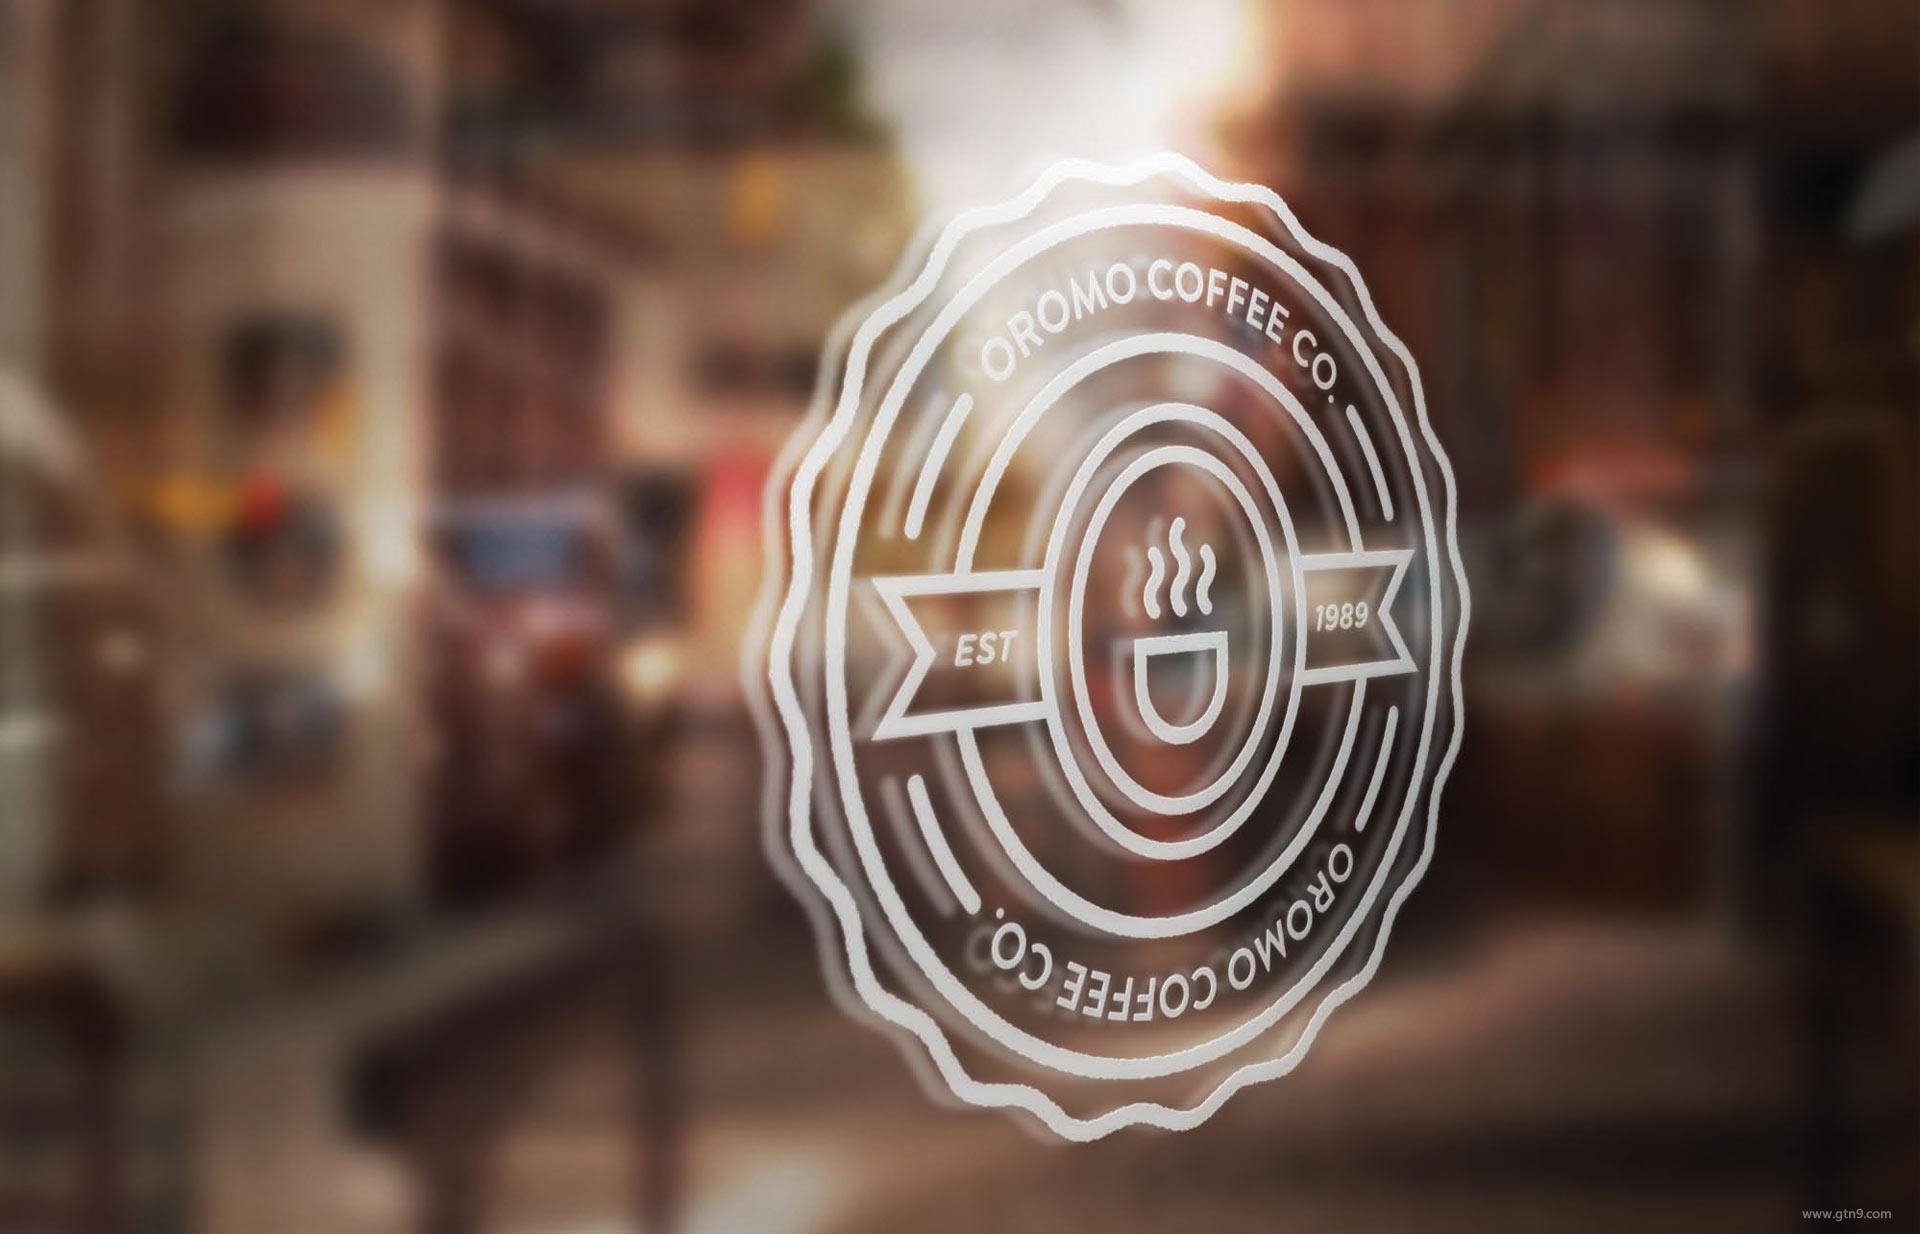 oromo coffee视觉形象设计